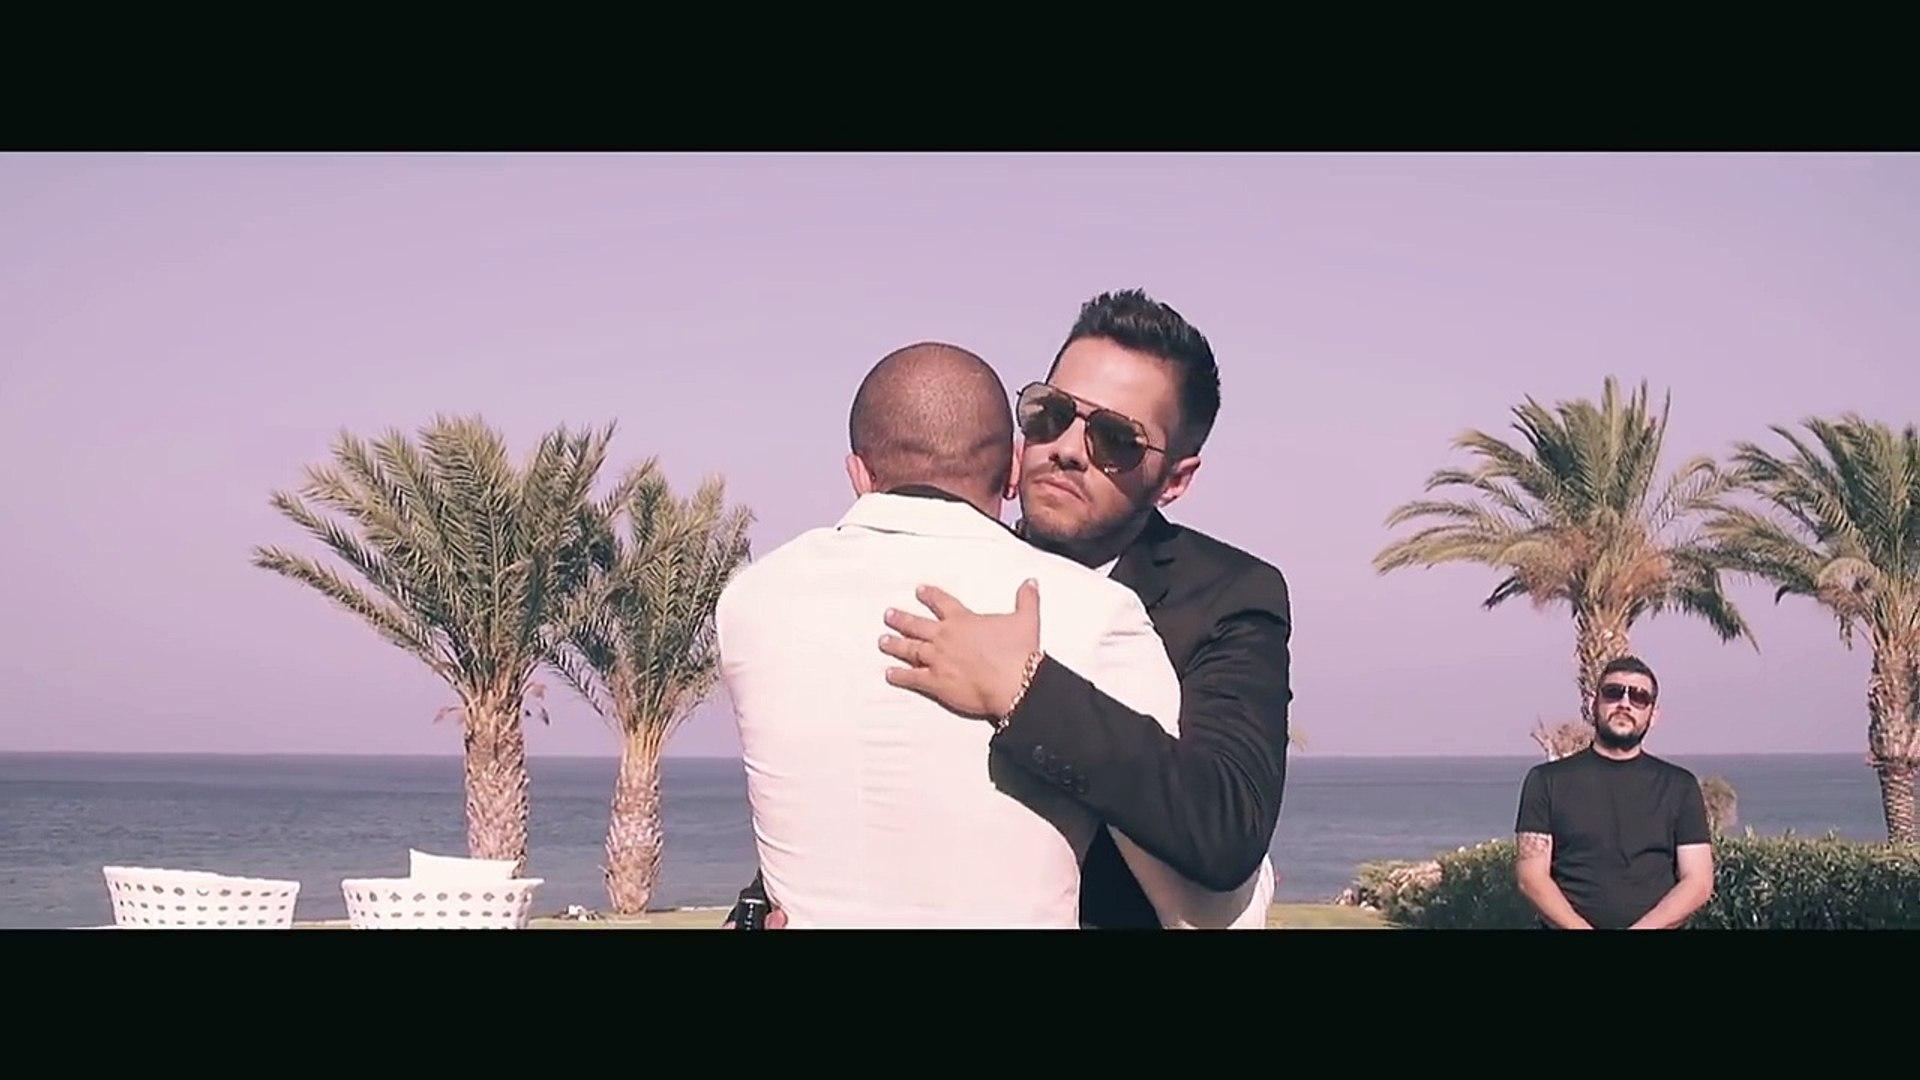 Tsalikis & Nicola Fasano Feat. Jazzy Jo - Somebody that i used to know